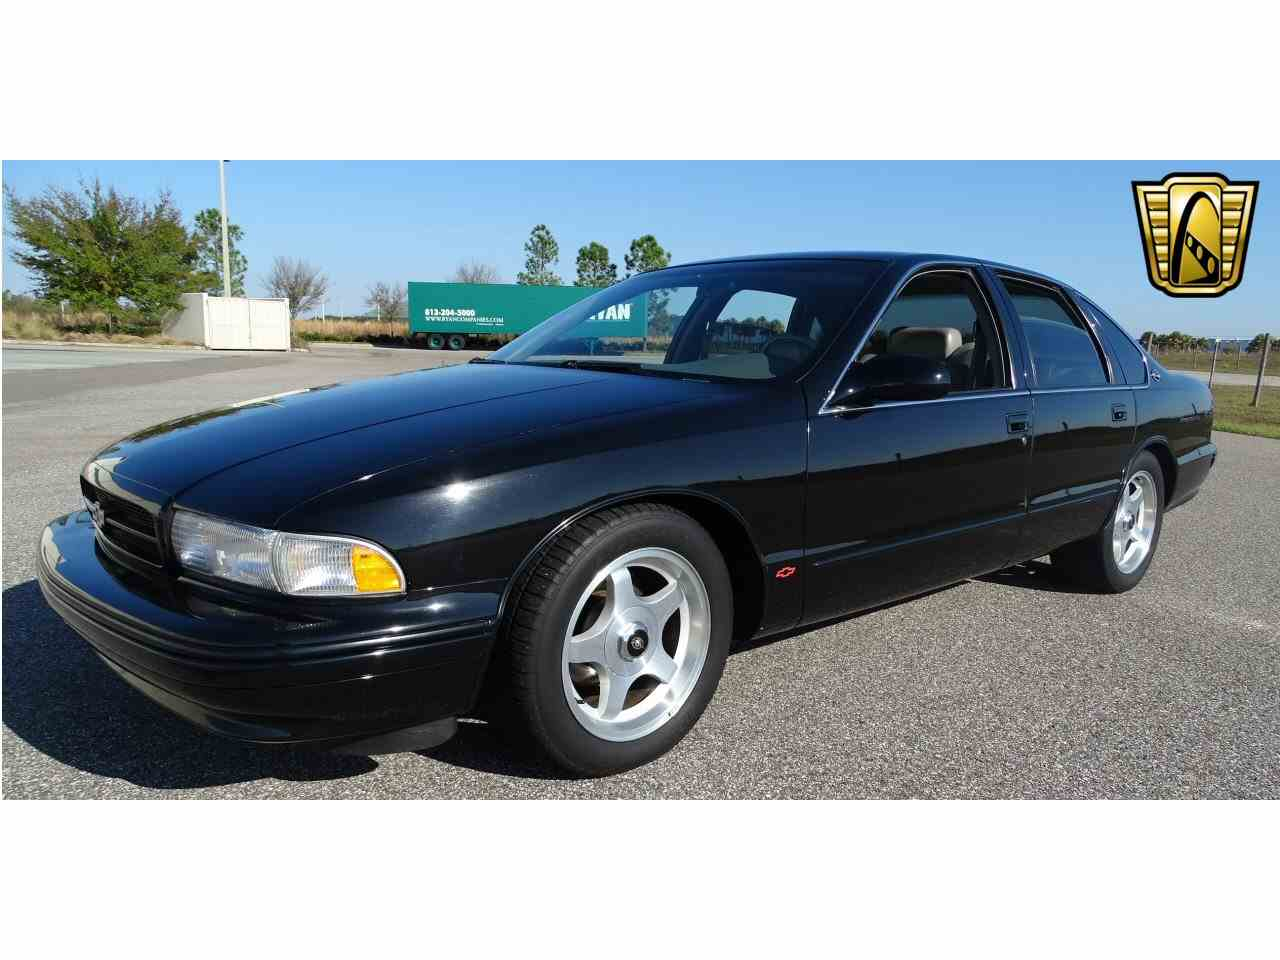 1995 Chevrolet Impala for Sale - CC-951343